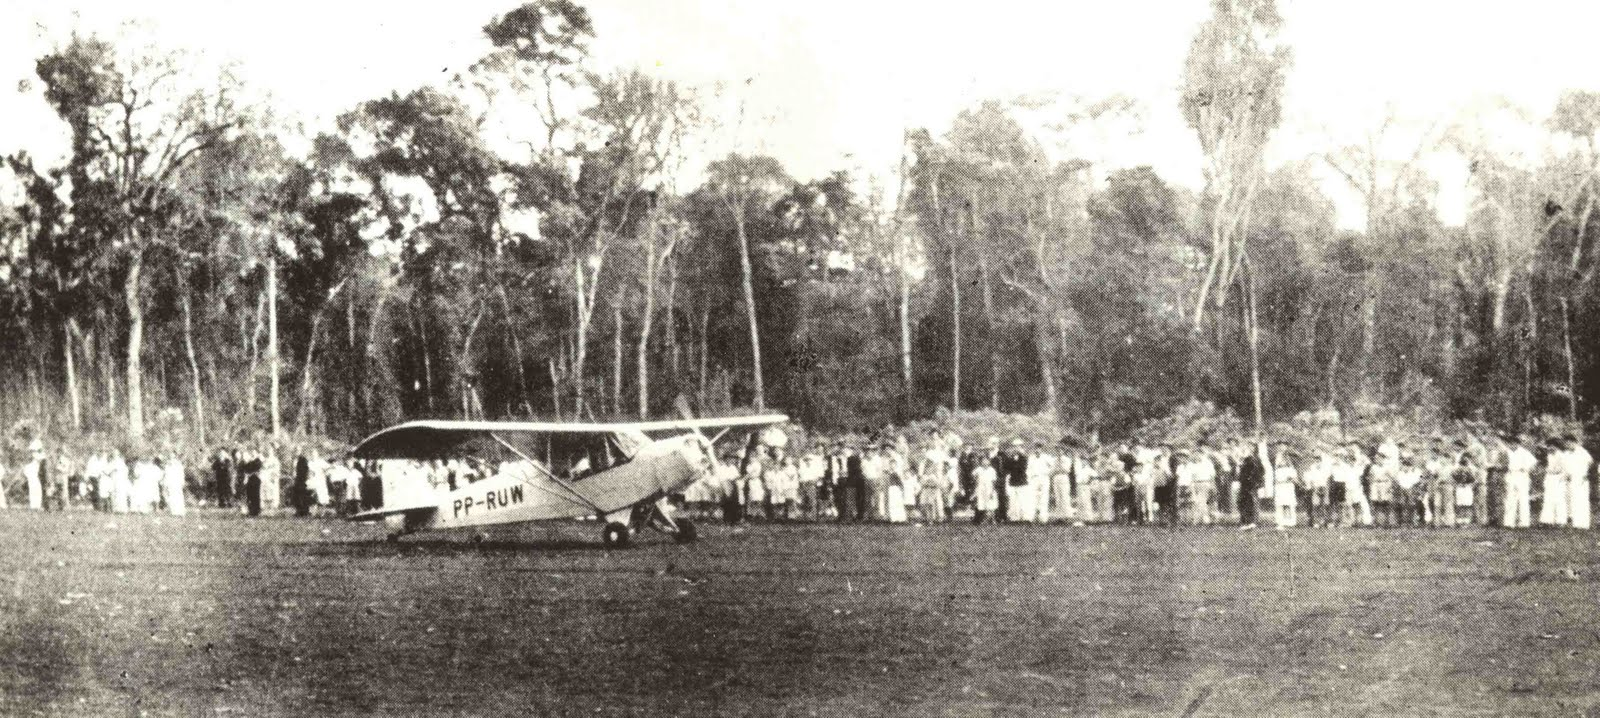 Aeroporto de Maringá - 1947 / 1949